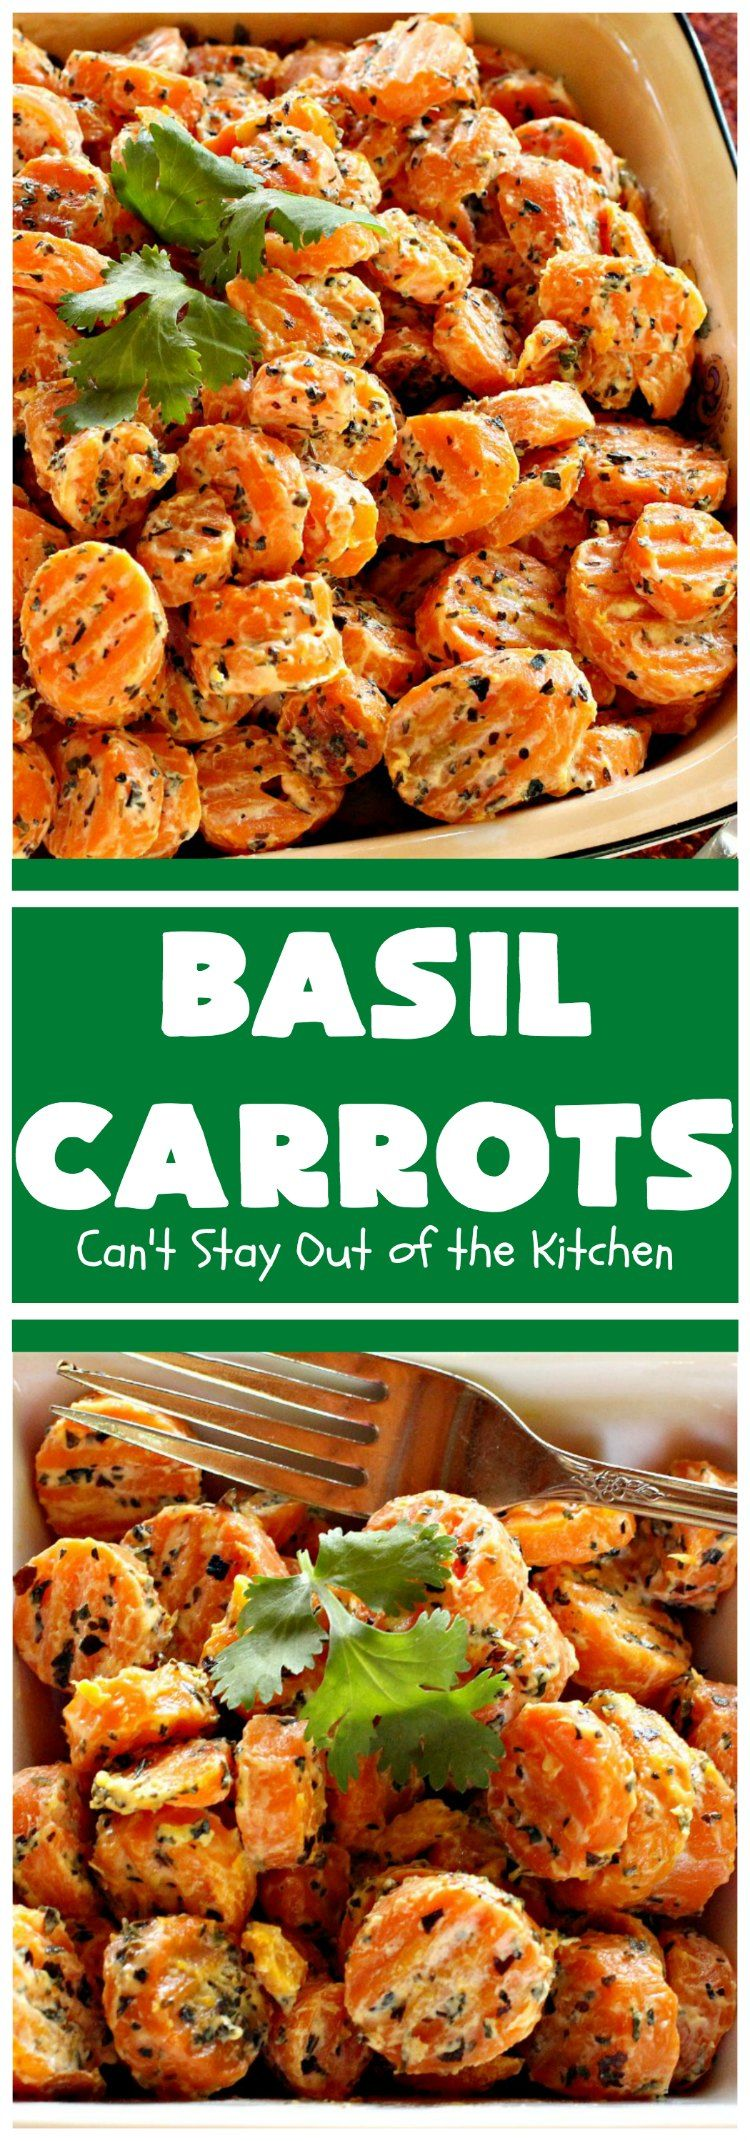 Basil Carrots images